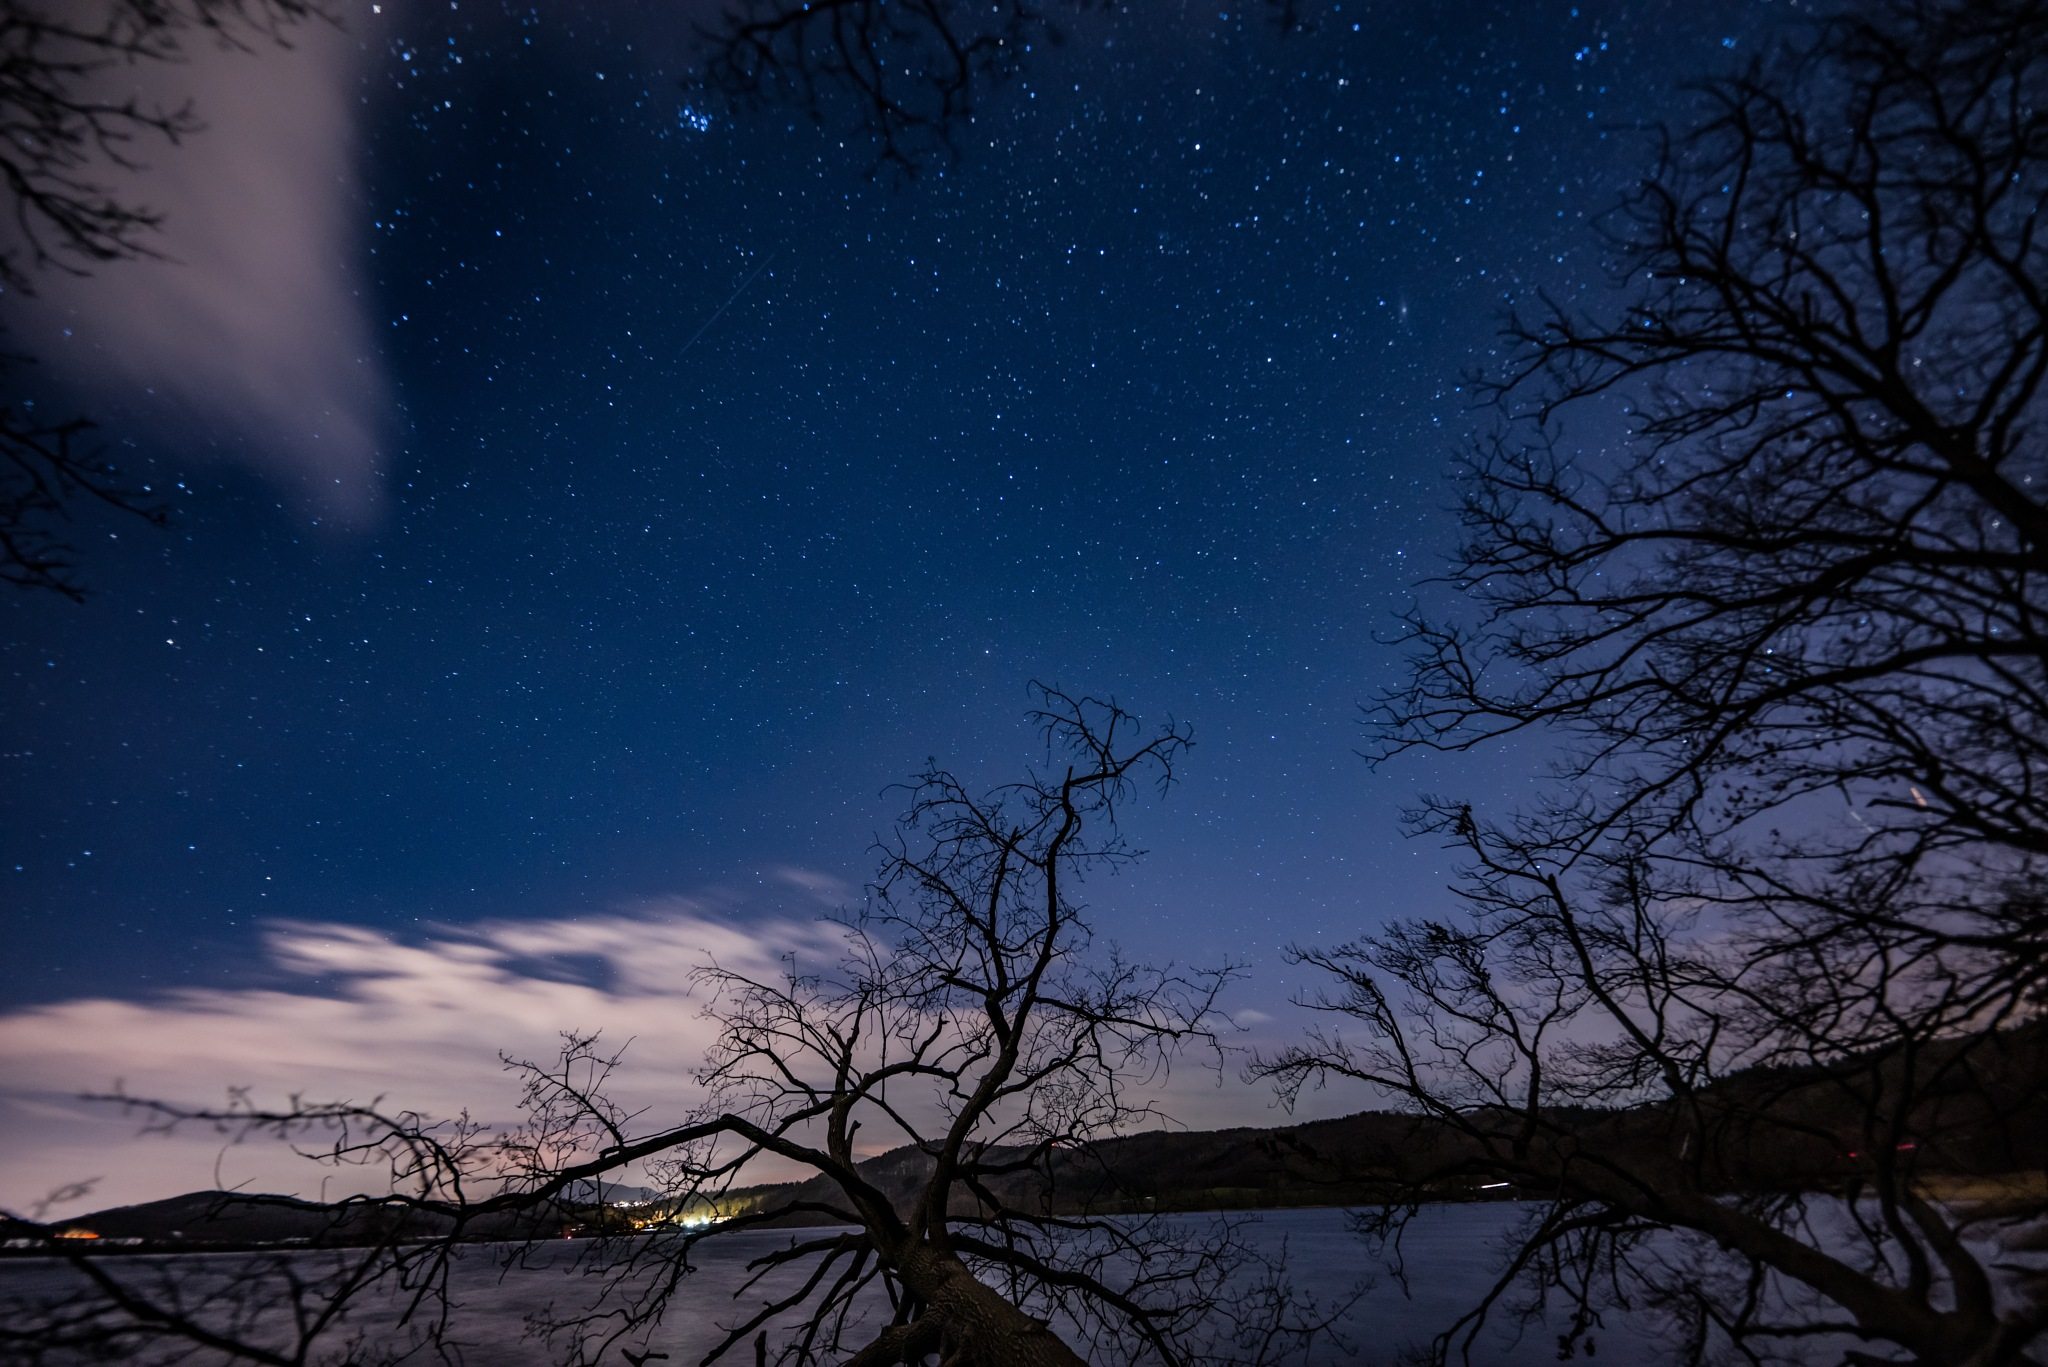 Photo in Astrophotography #germany #eifel #deutschland #astrofotographie #astrophotographers #astrophotography #amazing #longexposure #lakeside #lake #winter #trees #bäume #sternenhimmel #nachtfotografie #nightphotography #night photo #available light #stargazing